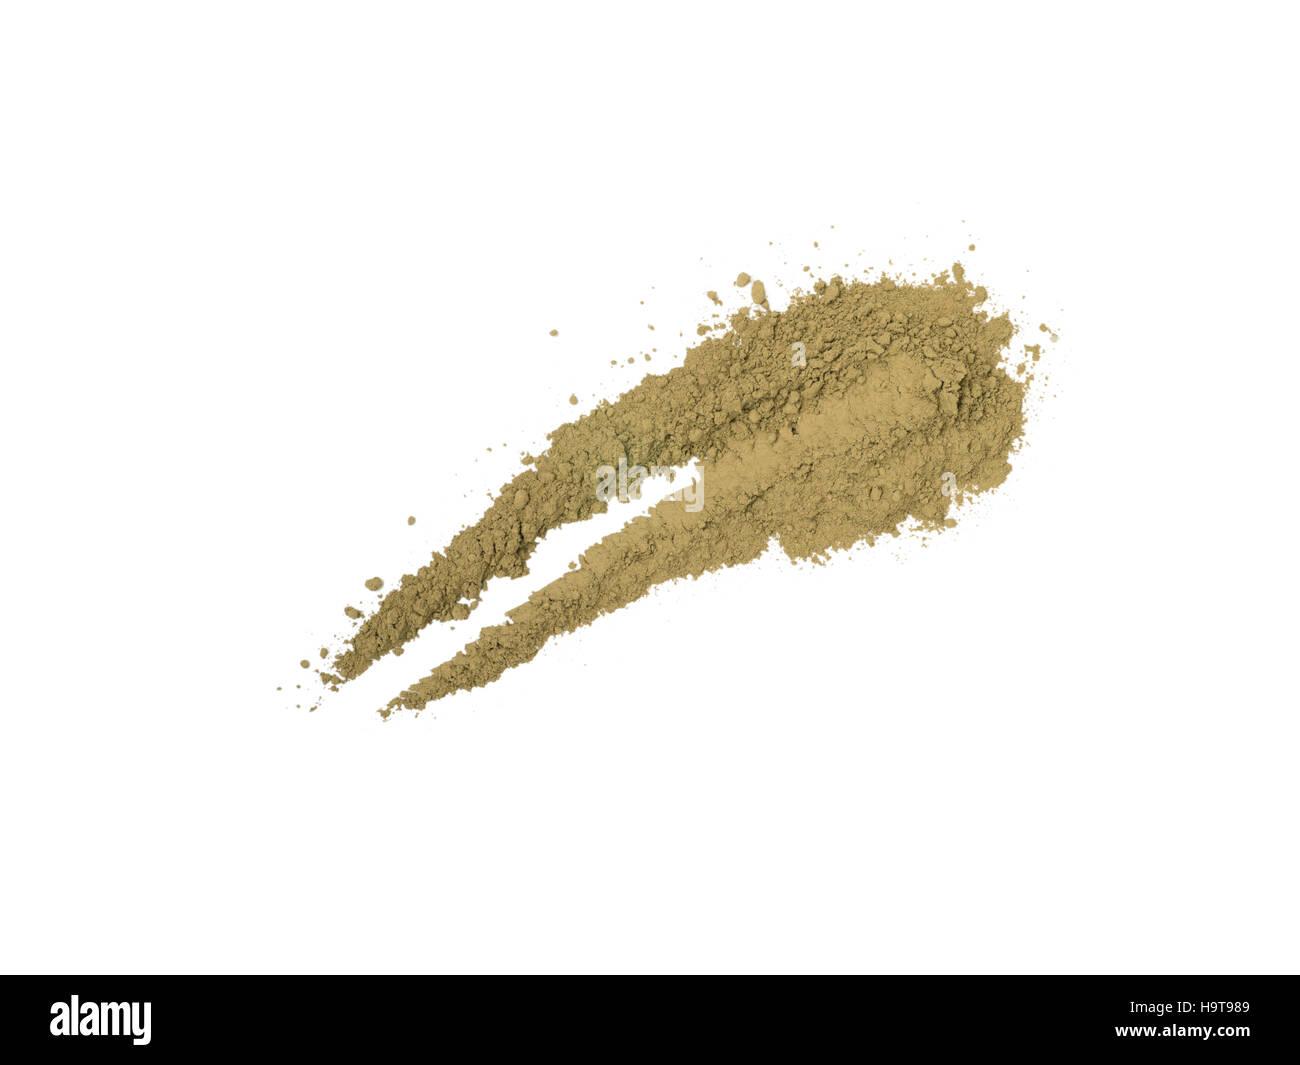 Henna lawsonia inermis powder sample stroke - Stock Image